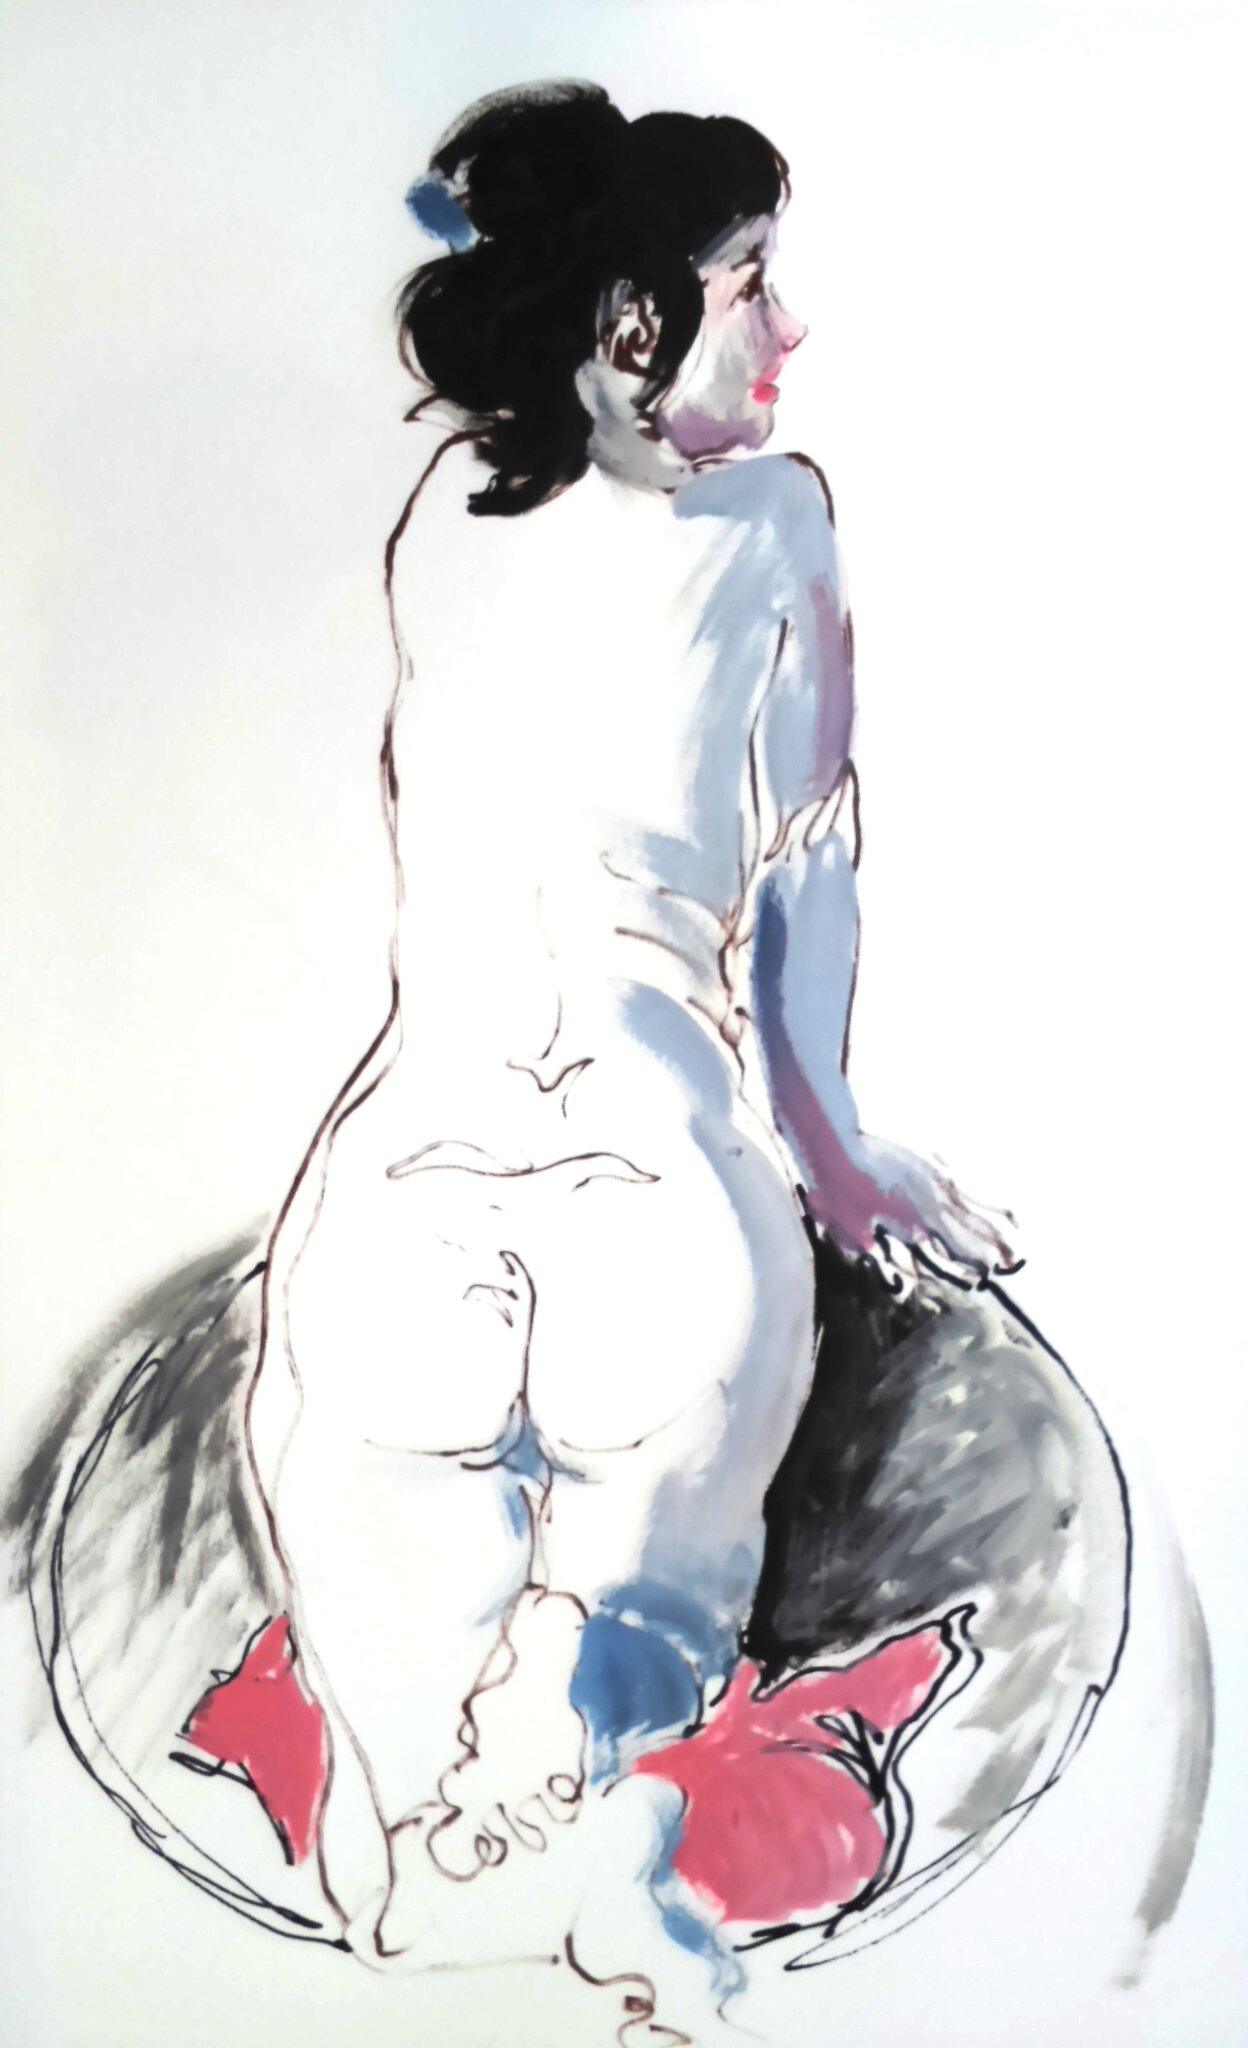 alain montoir atelier dessin peinture (4)